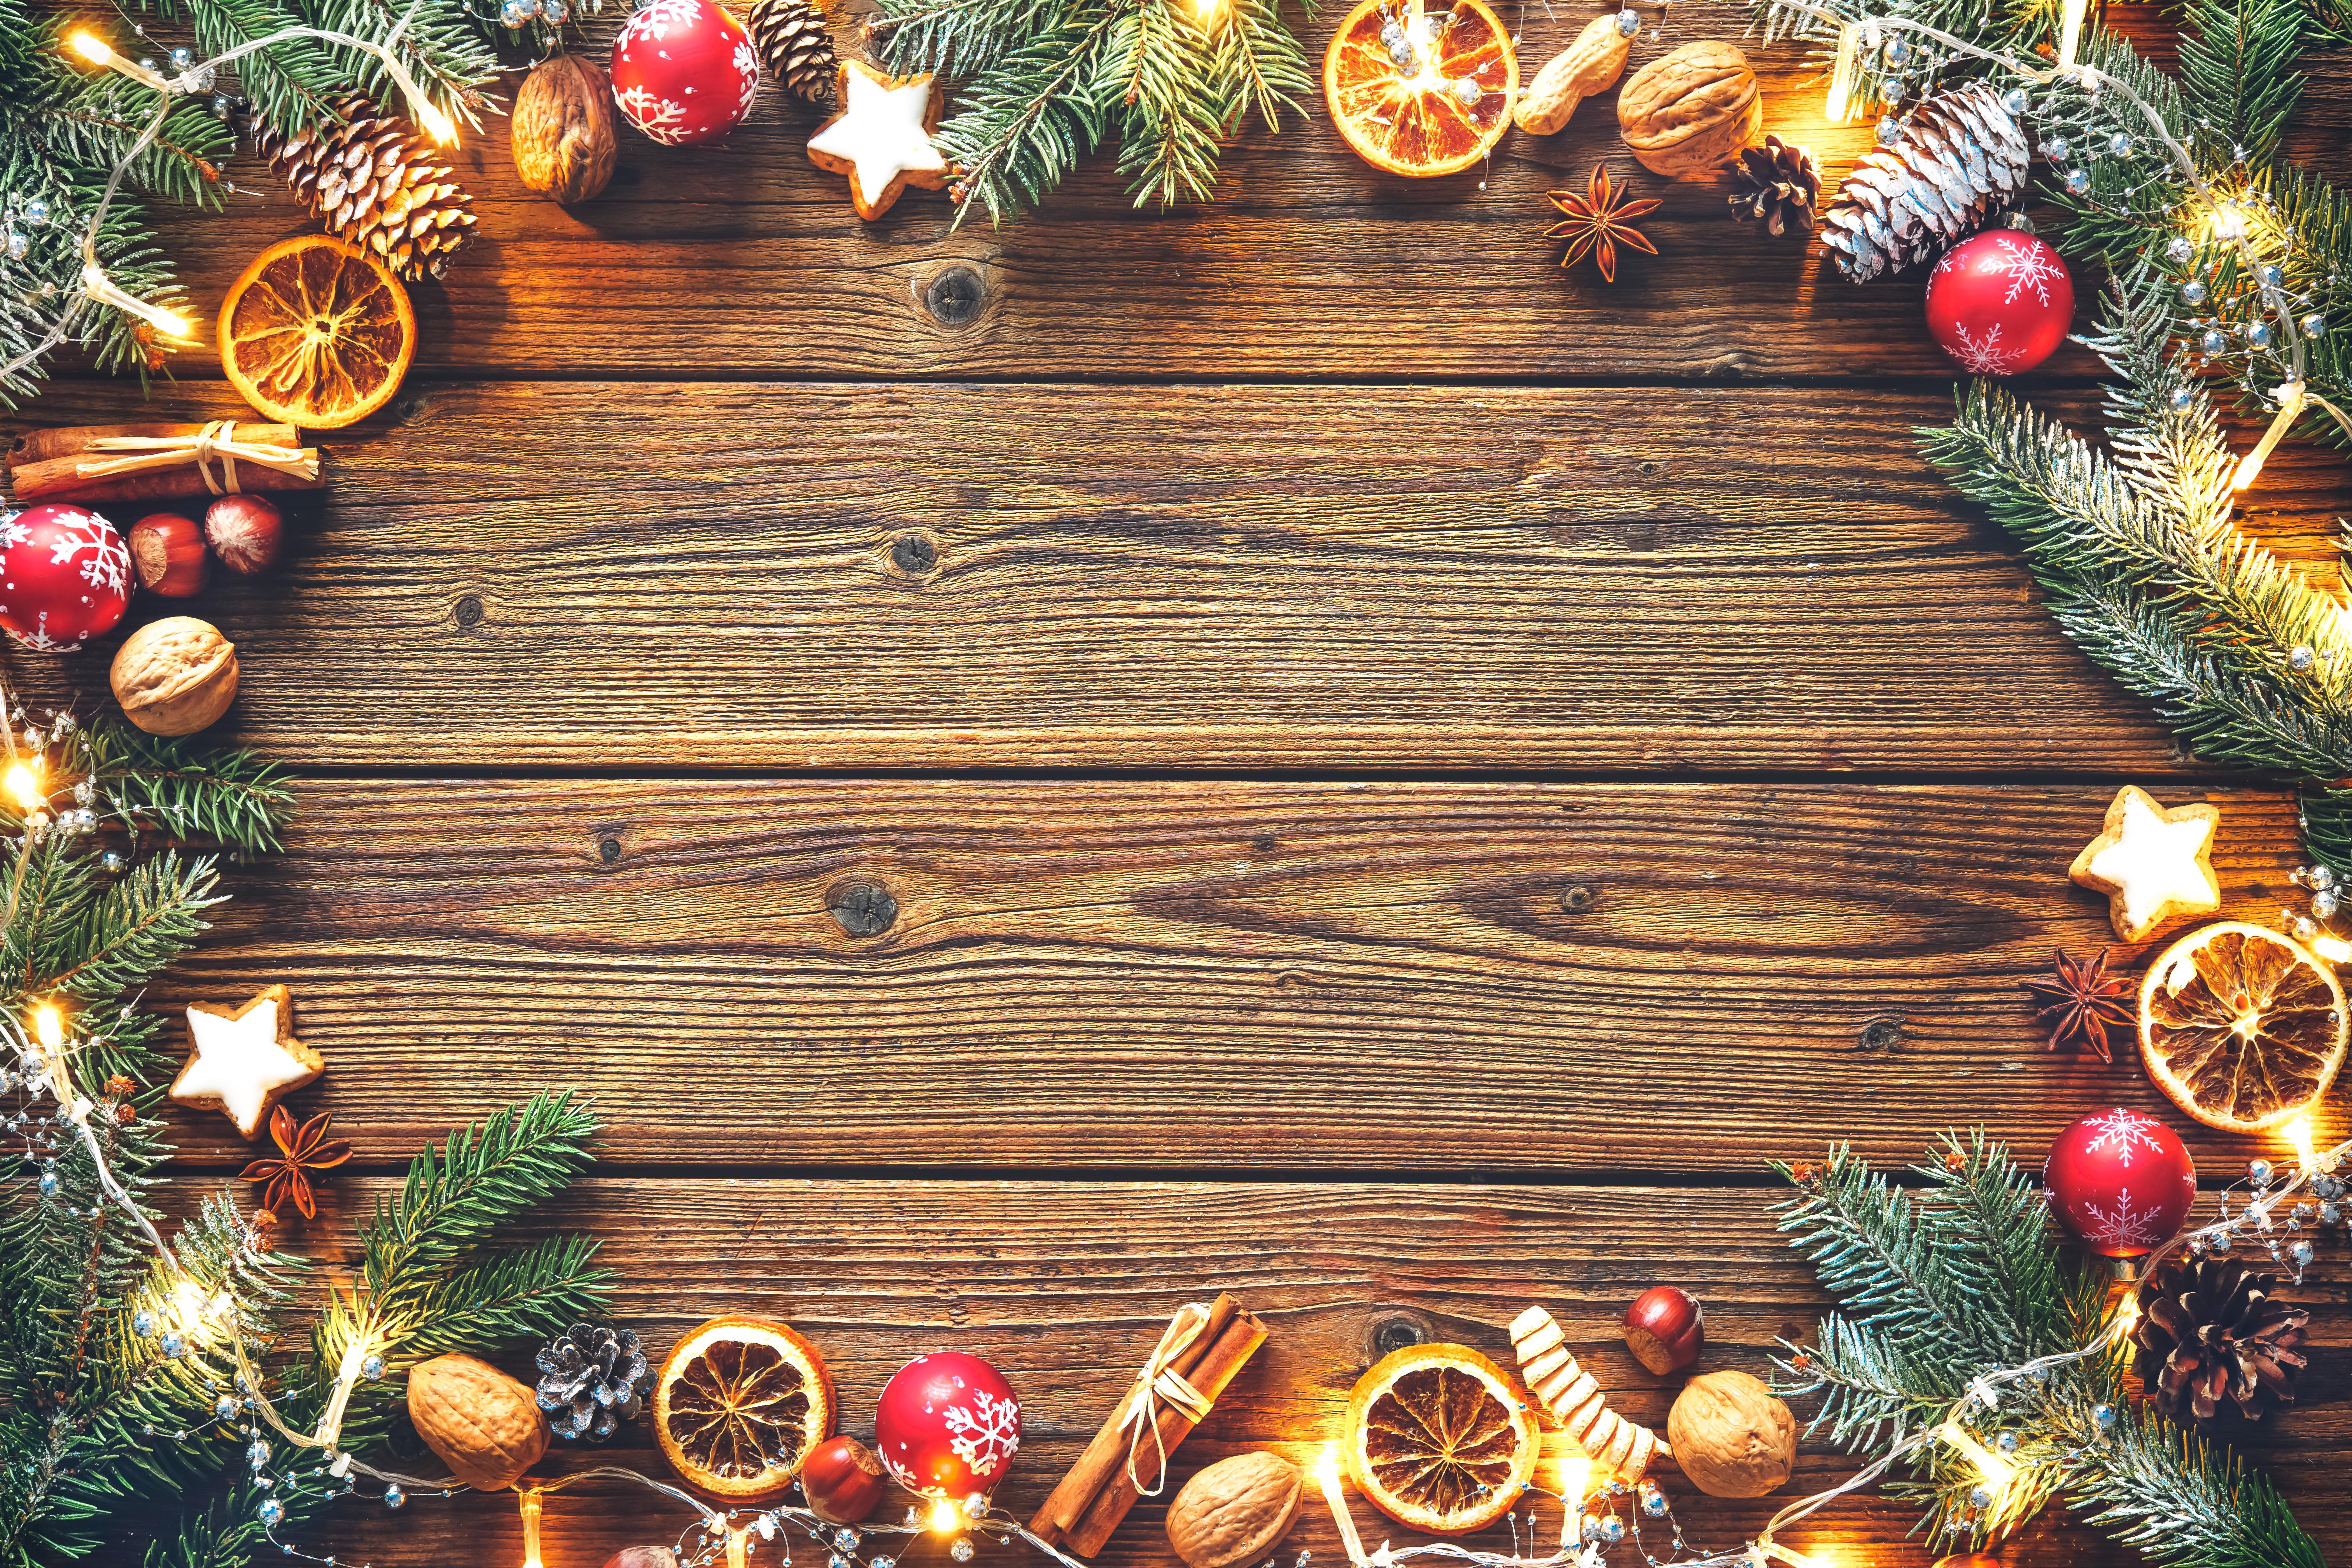 Amazing Wallpaper Christmas Wood - 779505  Graphic_515443 .jpg